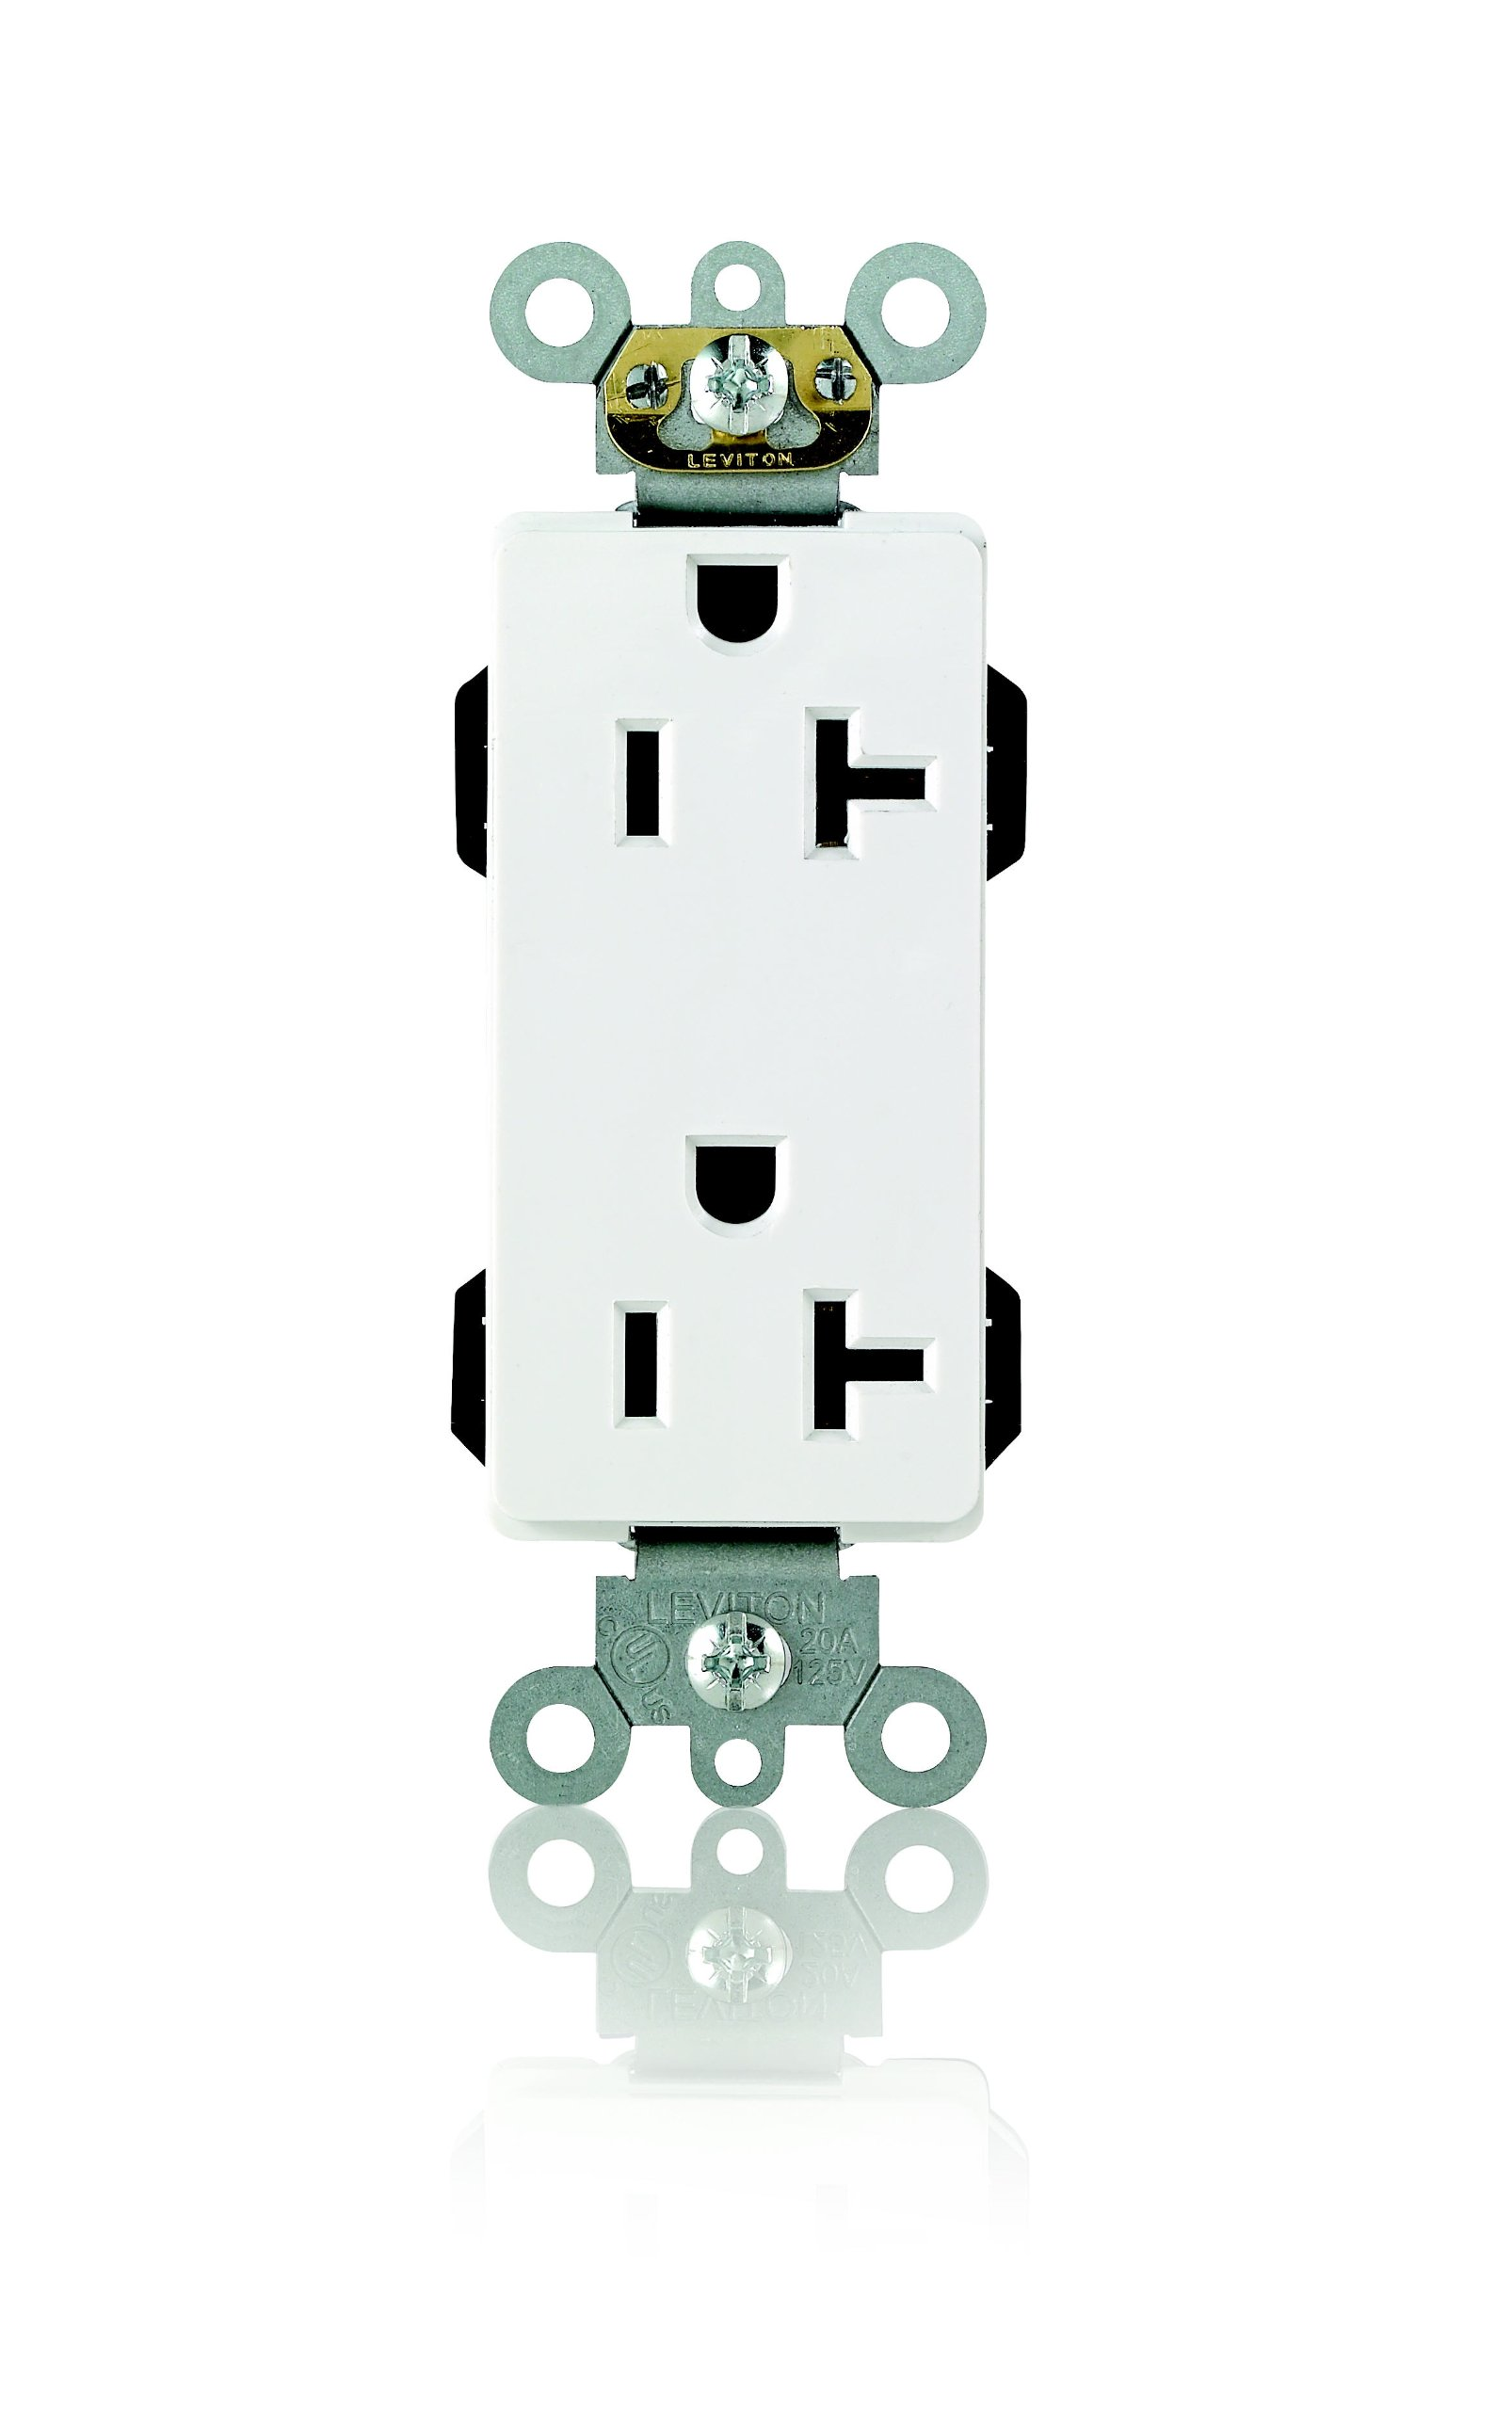 Leviton M1636-W Lev-Lok Modular Wiring Device 20-Amp, 125-Volt, Decora Plus Duplex Receptacle, Commercial Grade, Straight Blade, Self Grounding, White